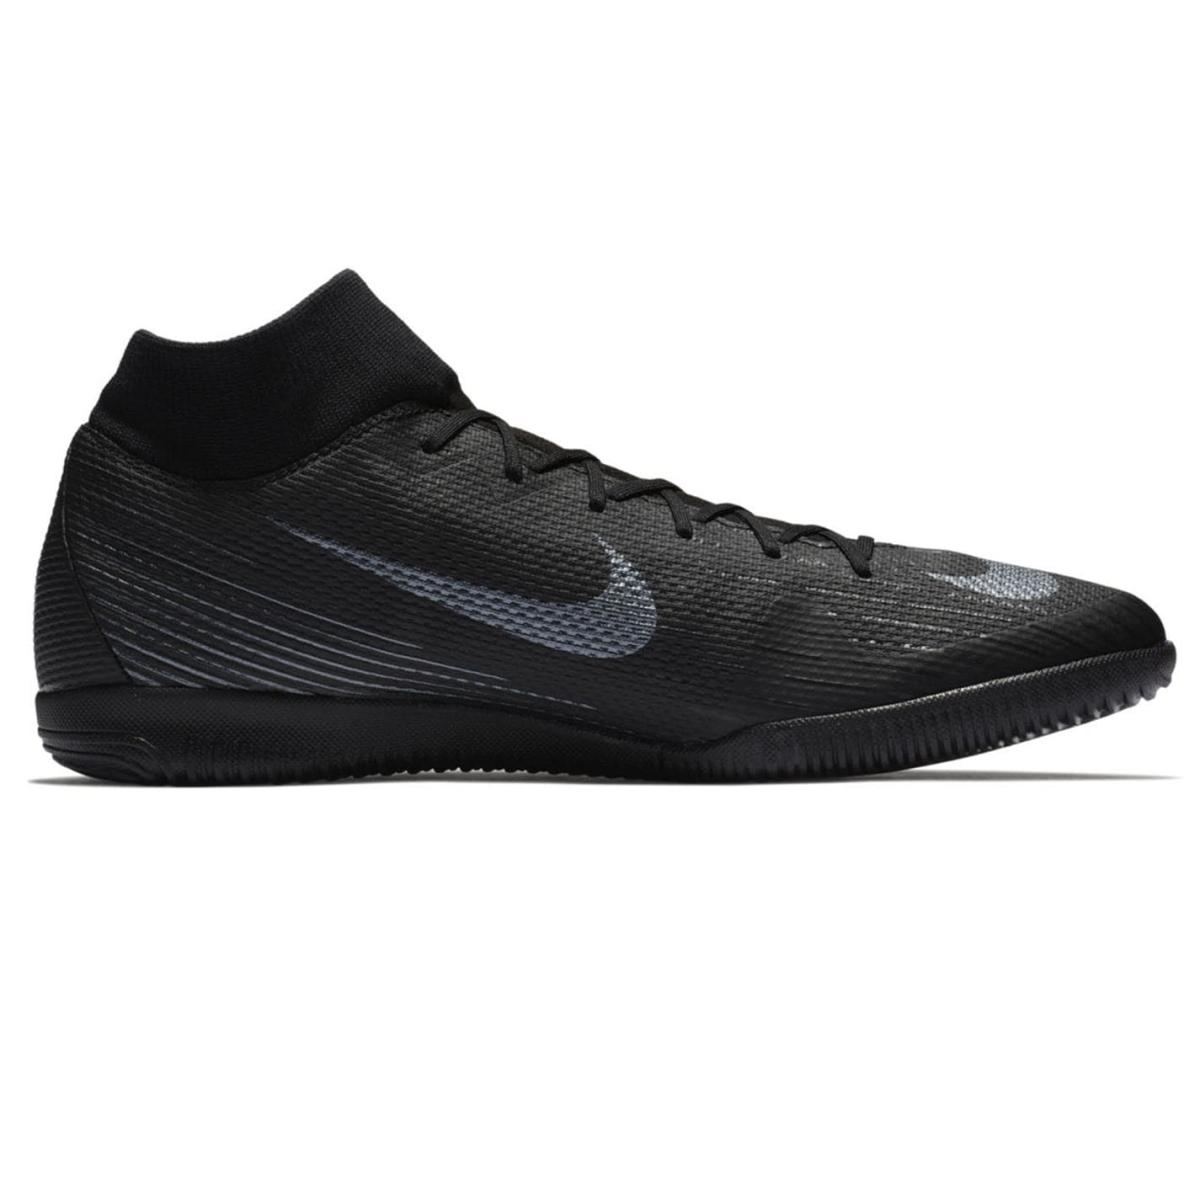 Details zu Nike Mercurial Superfly Academy DF Hallenschuhe Fußballschuhe Indoor Herren 047